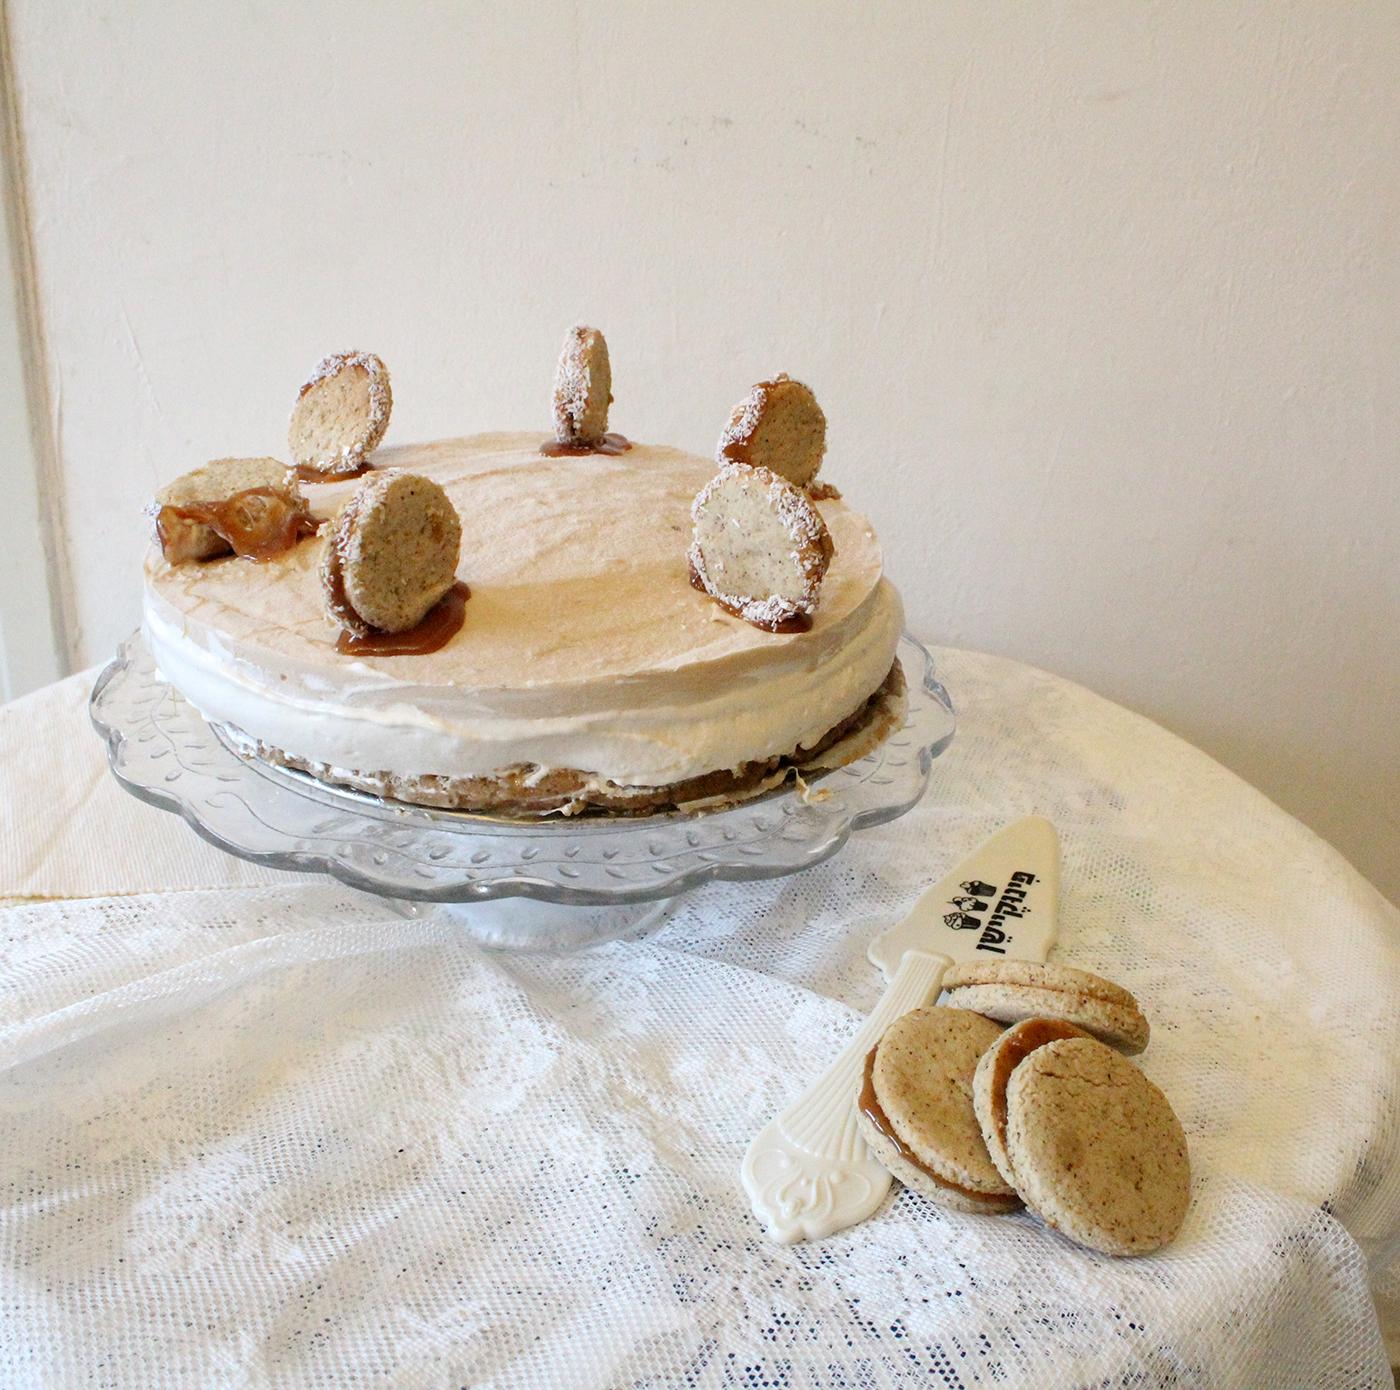 IMG 7786 - עוגת מוס על בסיס אלפחורס